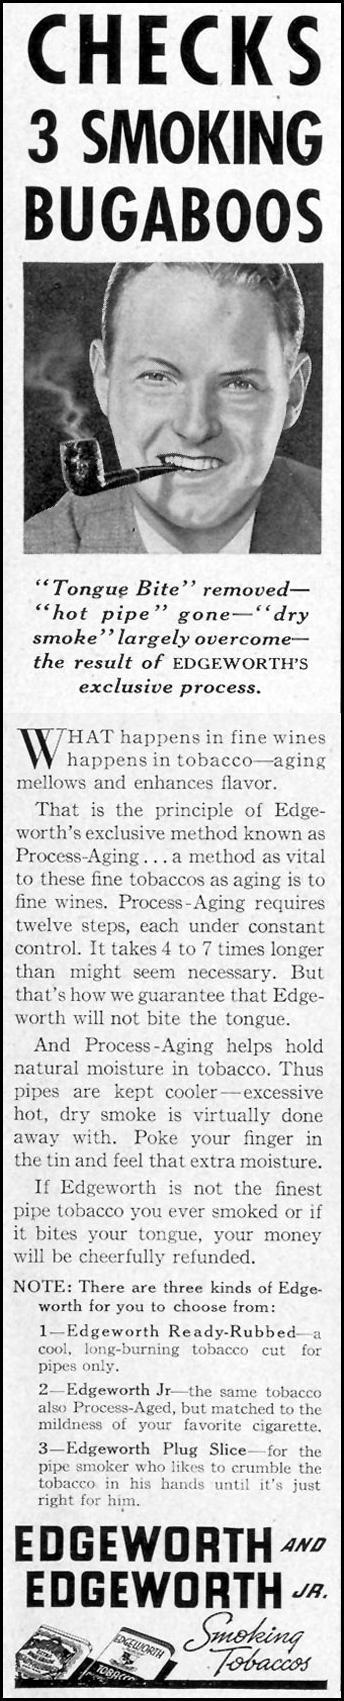 EDGEWORTH AND EDGEWORTH JR. SMOKING TOBACCOS LIFE 09/20/1937 p. 99